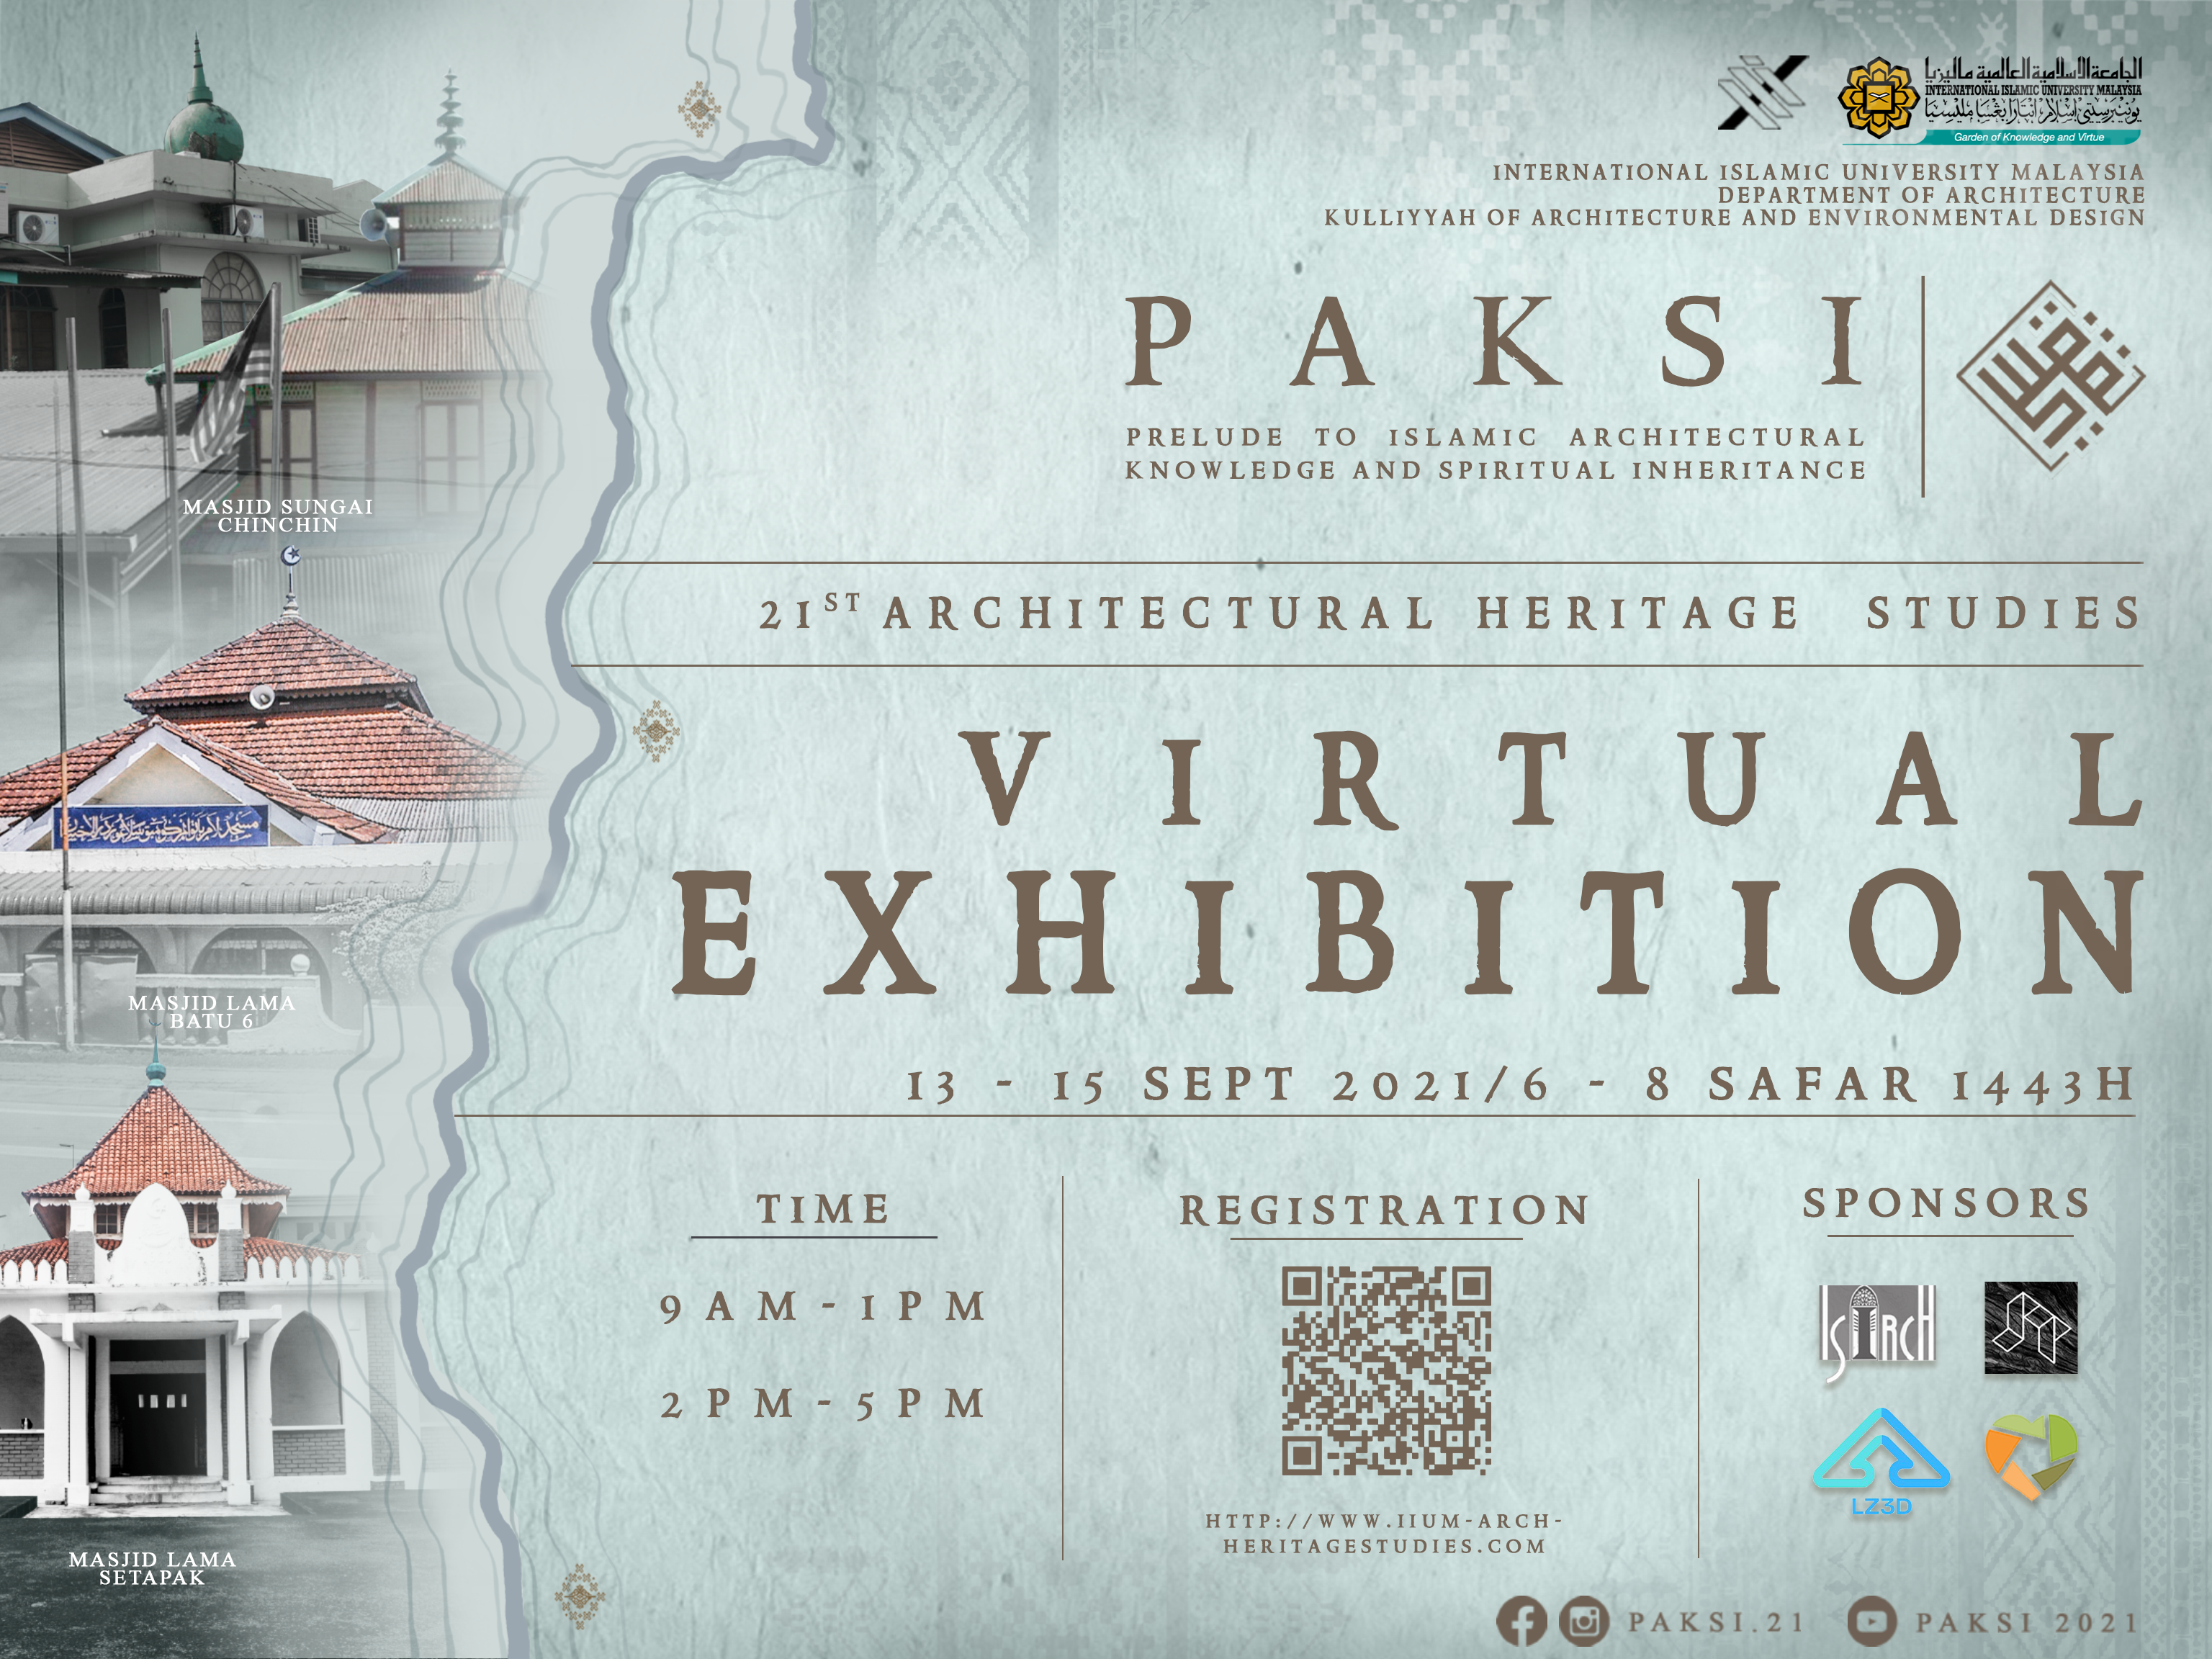 PAKSI 2021 (Prelude to Islamic Architectural Knowledge And Spiritual Inheritance)